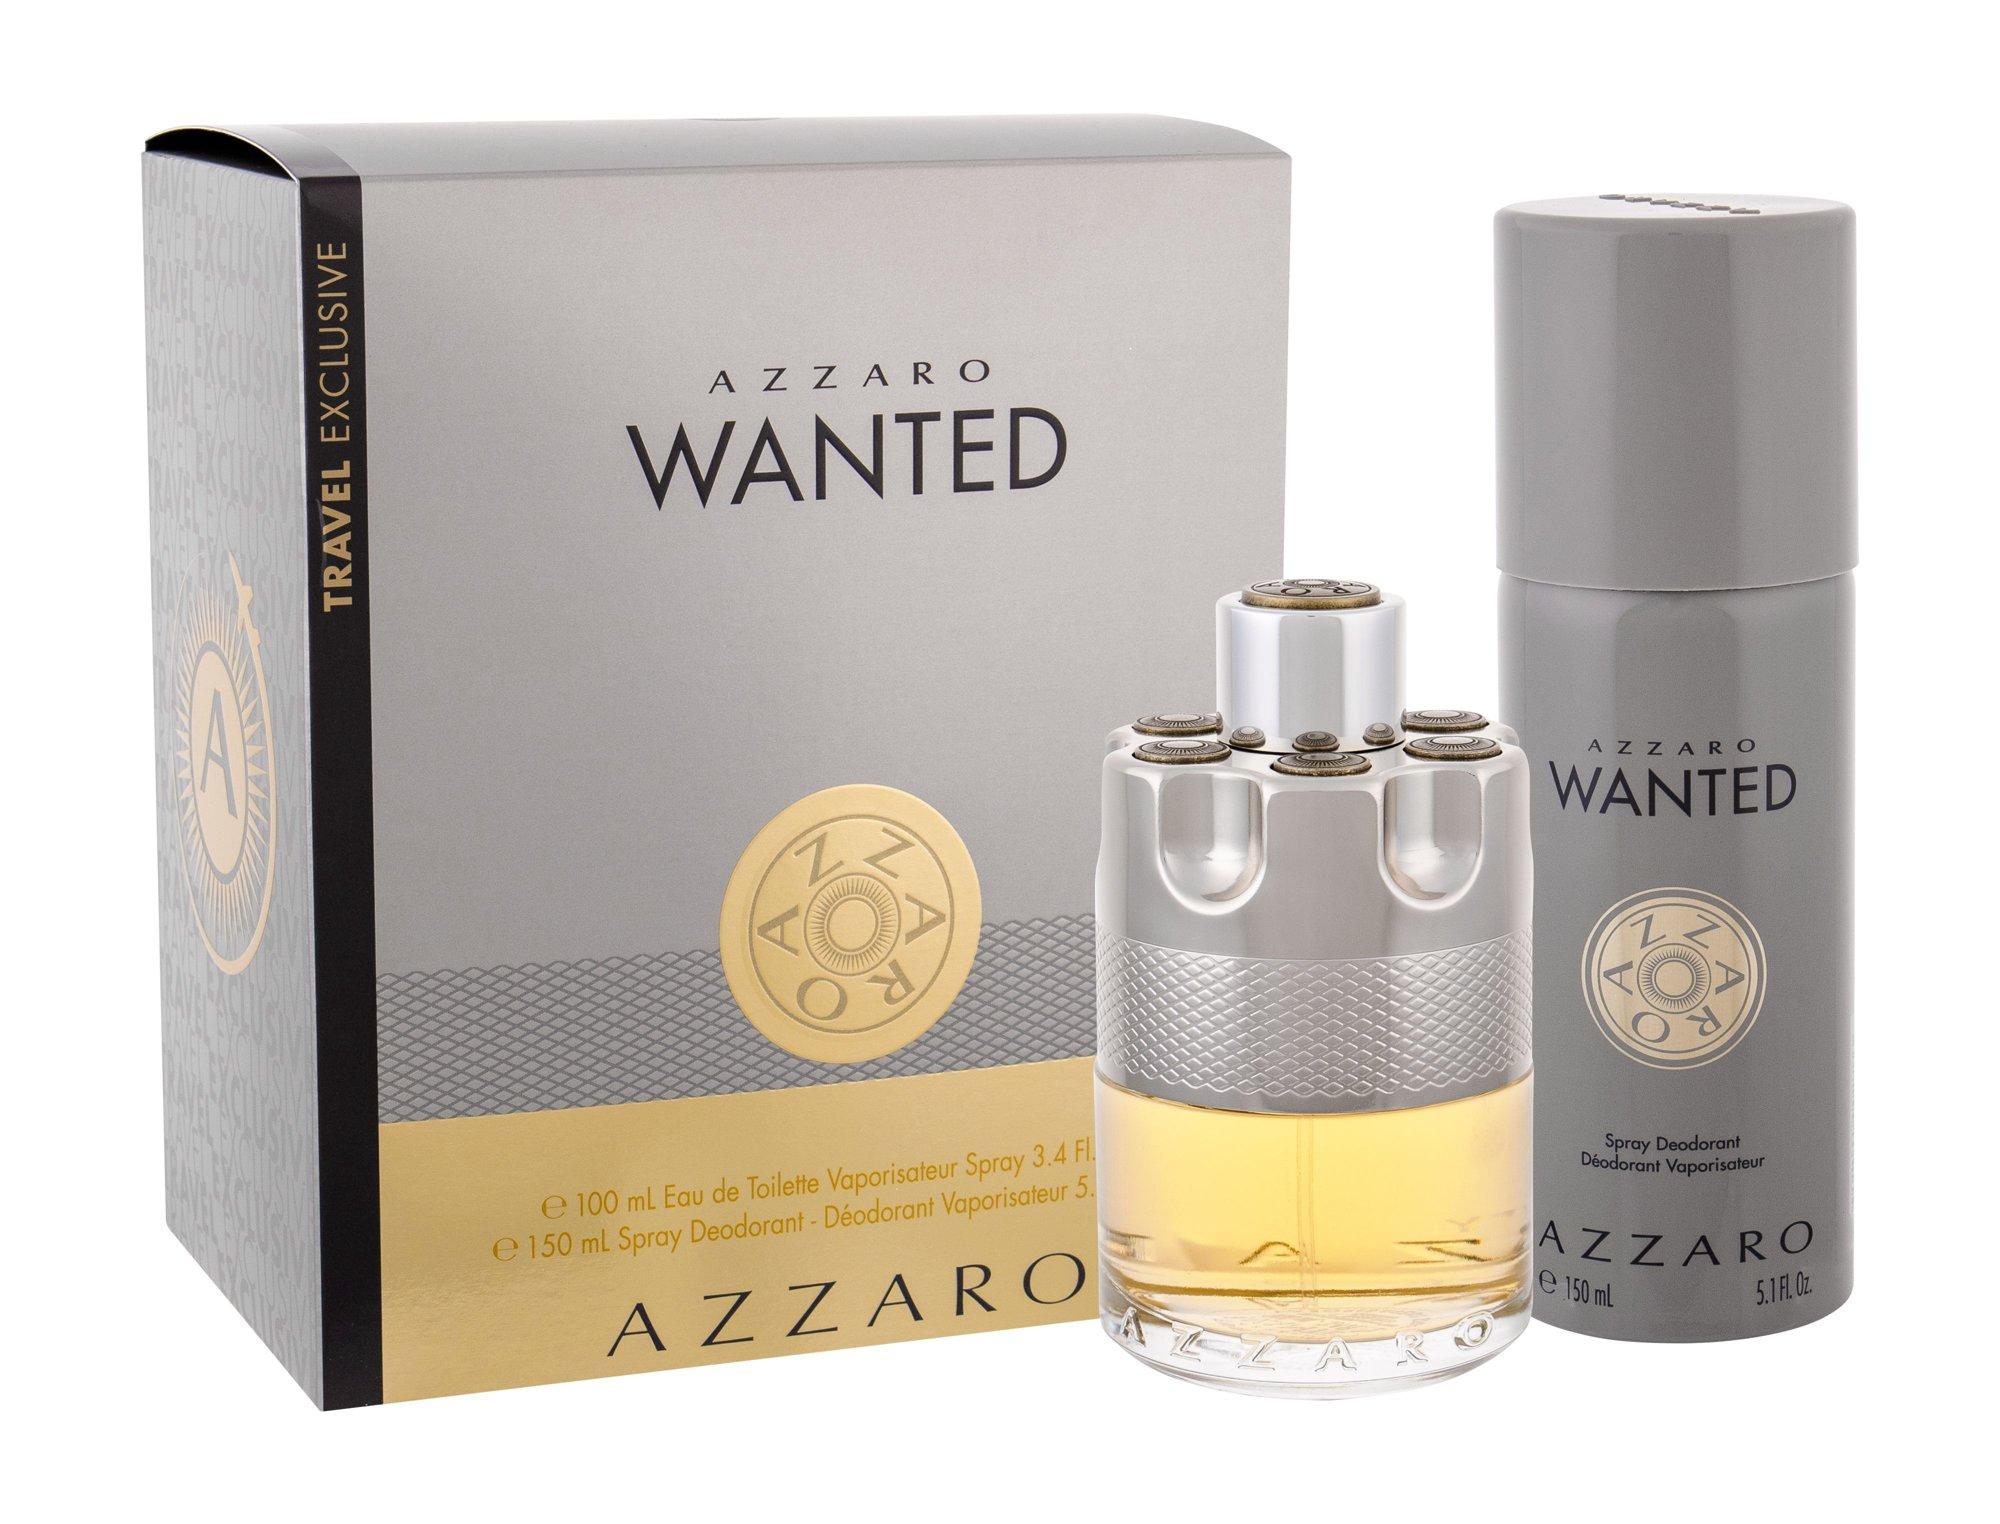 Azzaro Wanted, toaletná voda 100 ml + deodorant 150 ml